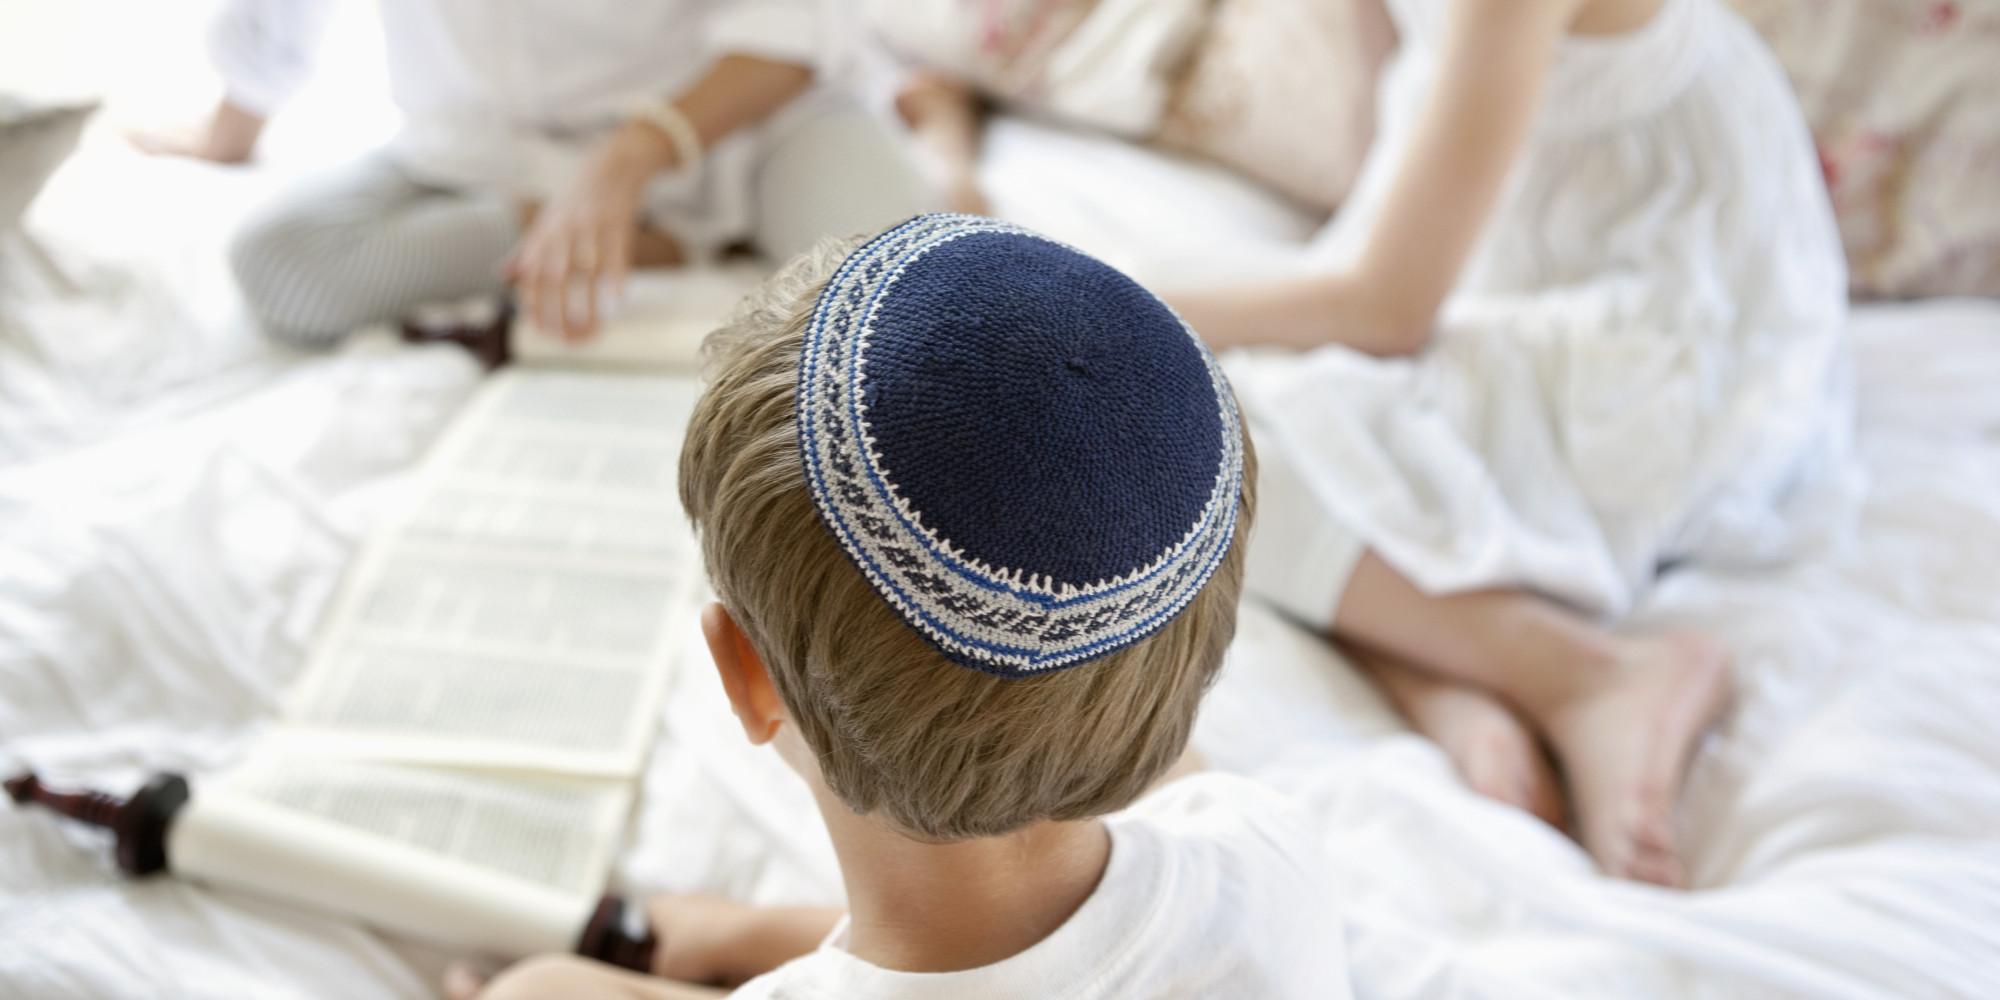 Hiljot Talmud Torá I – Shuljan Aruj, Iore Deá 245